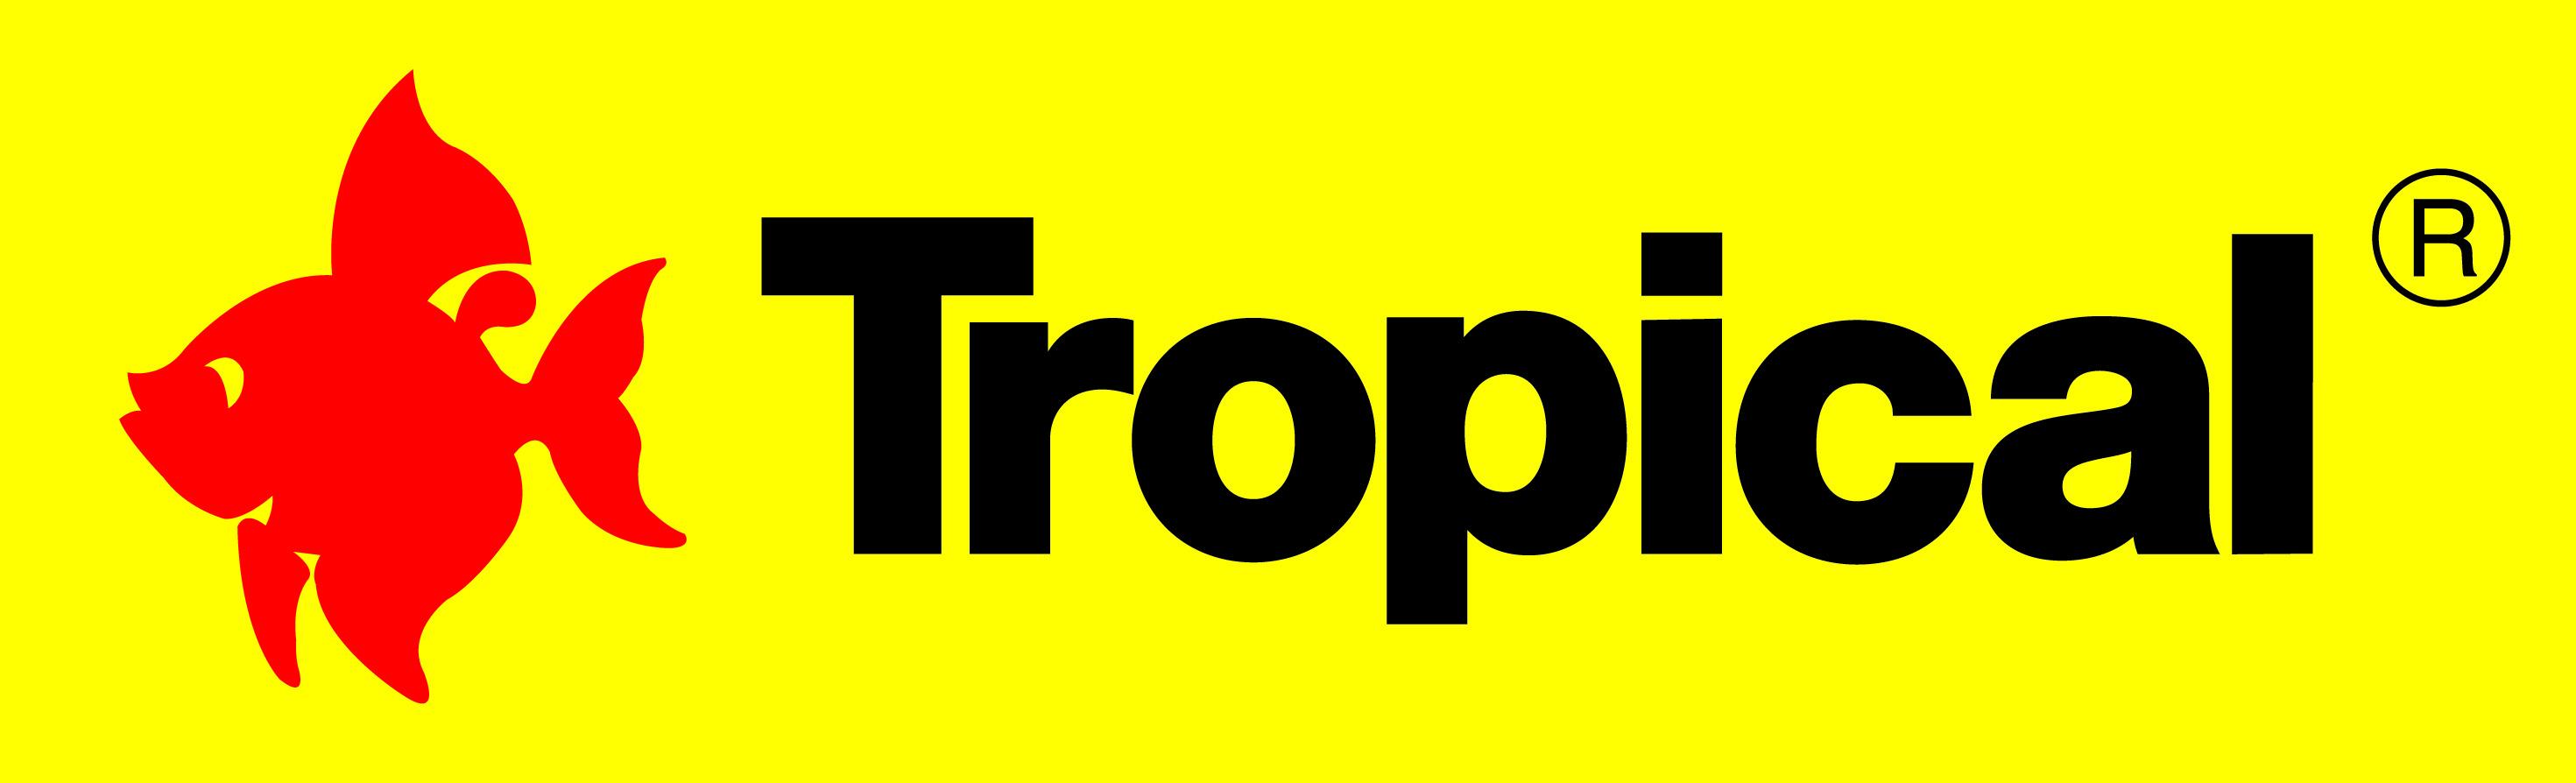 Tropical kopiera